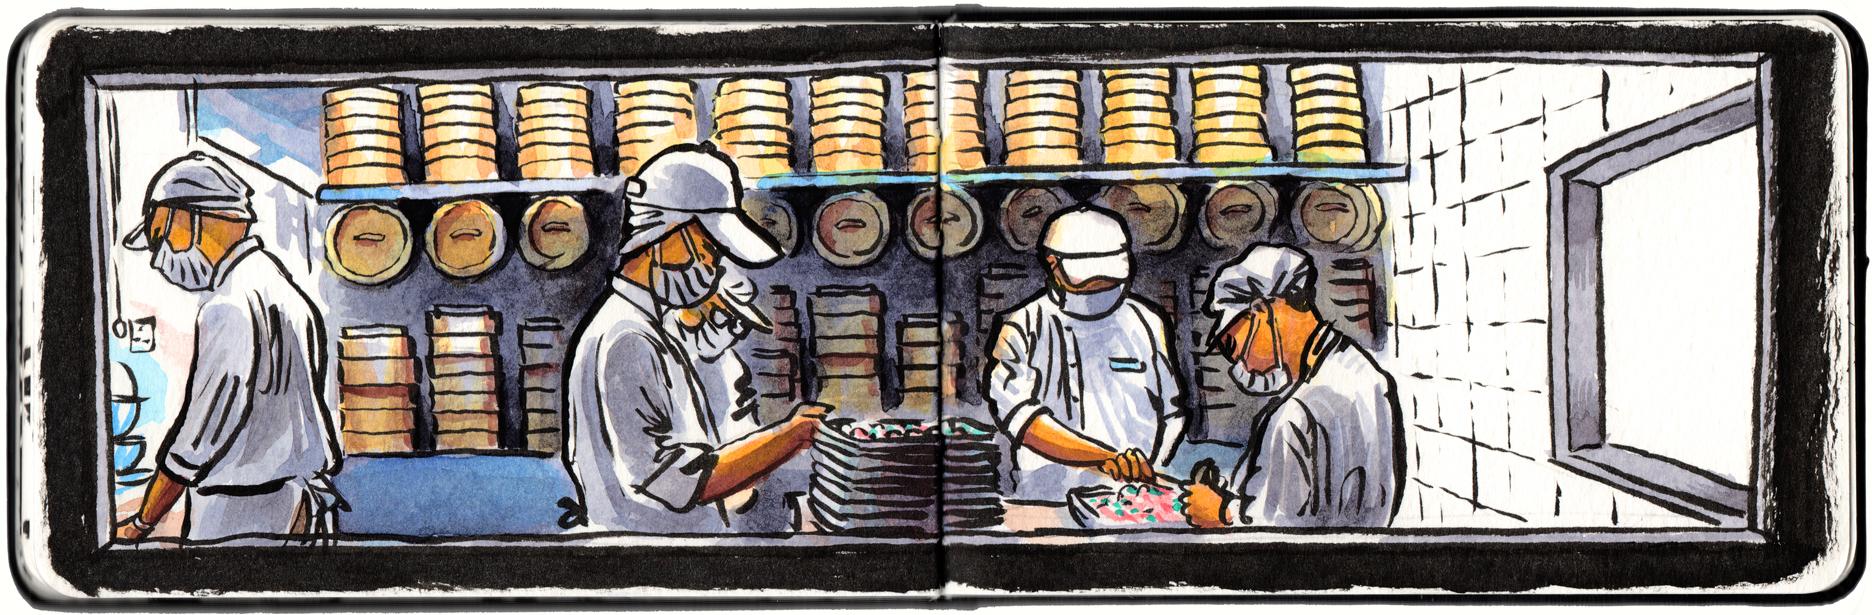 Dumpling makers at Crystal Jade, Shatin.